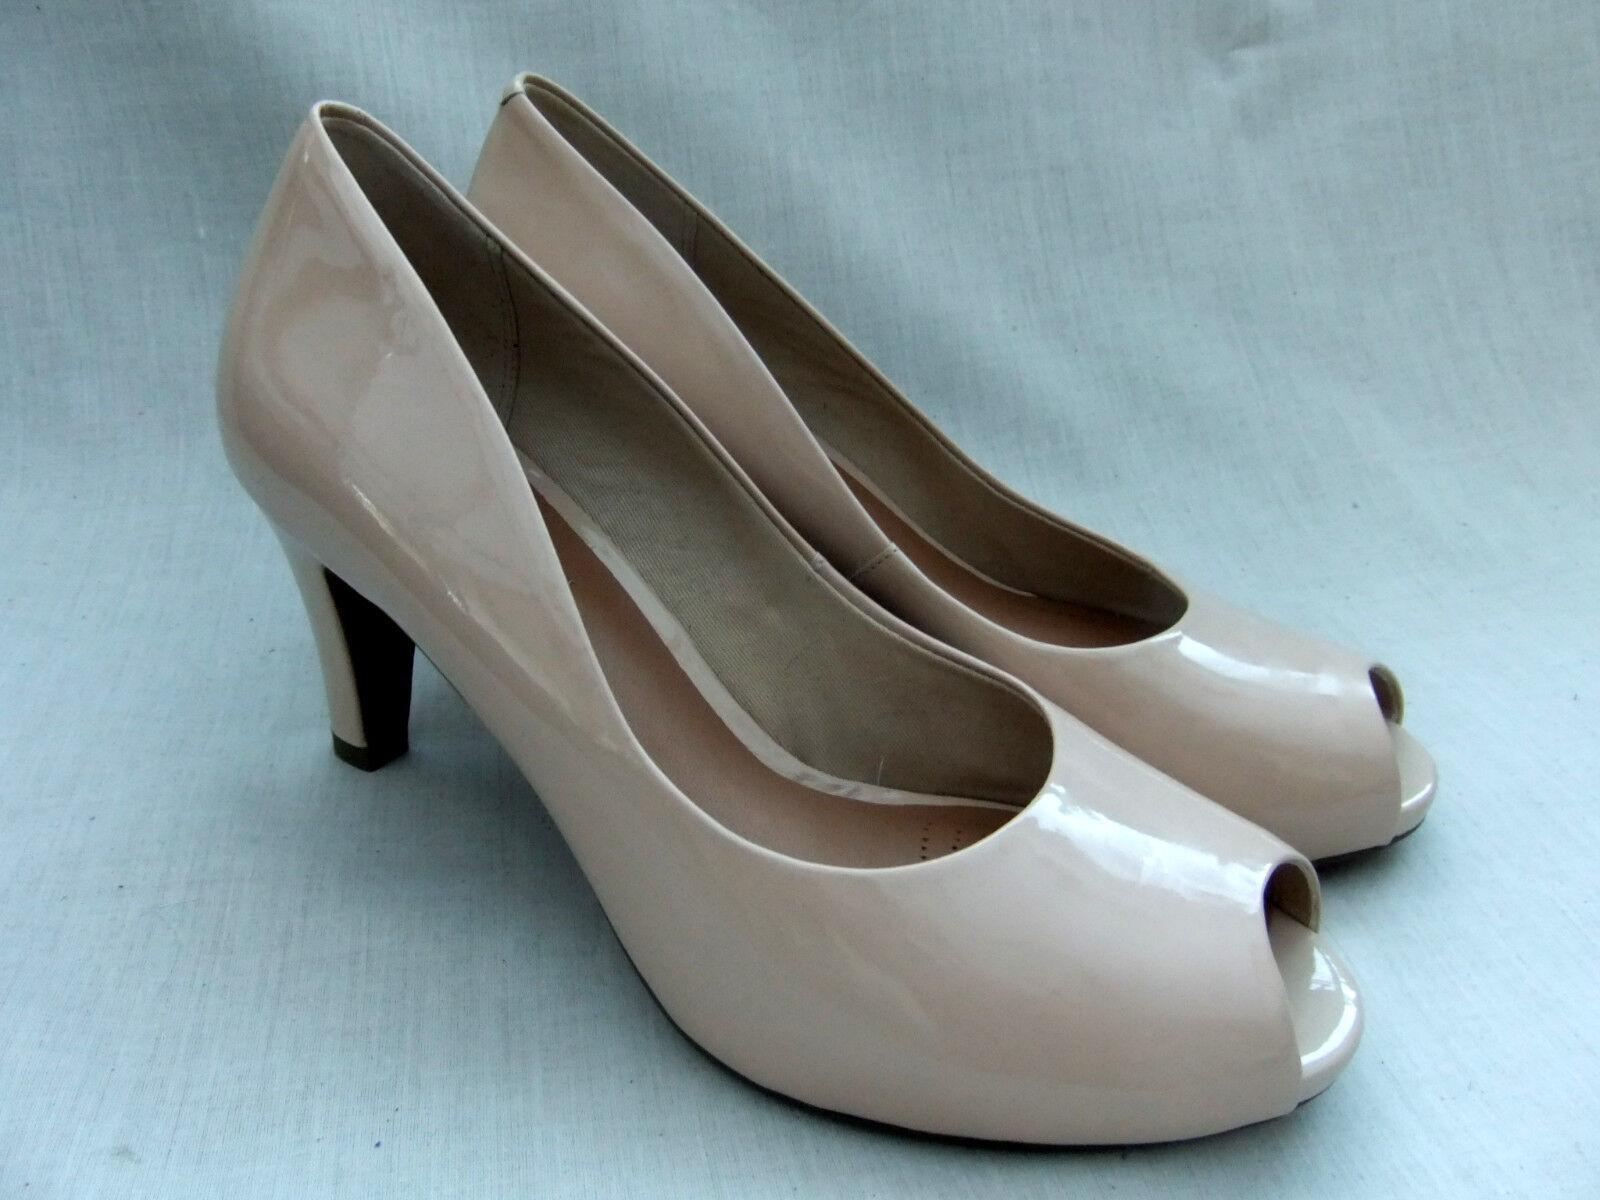 NEW CLARKS CHORUS SING Damenschuhe Schuhe NUDE PATENT LEATHER PEEP-TOE Schuhe Damenschuhe 6104f8